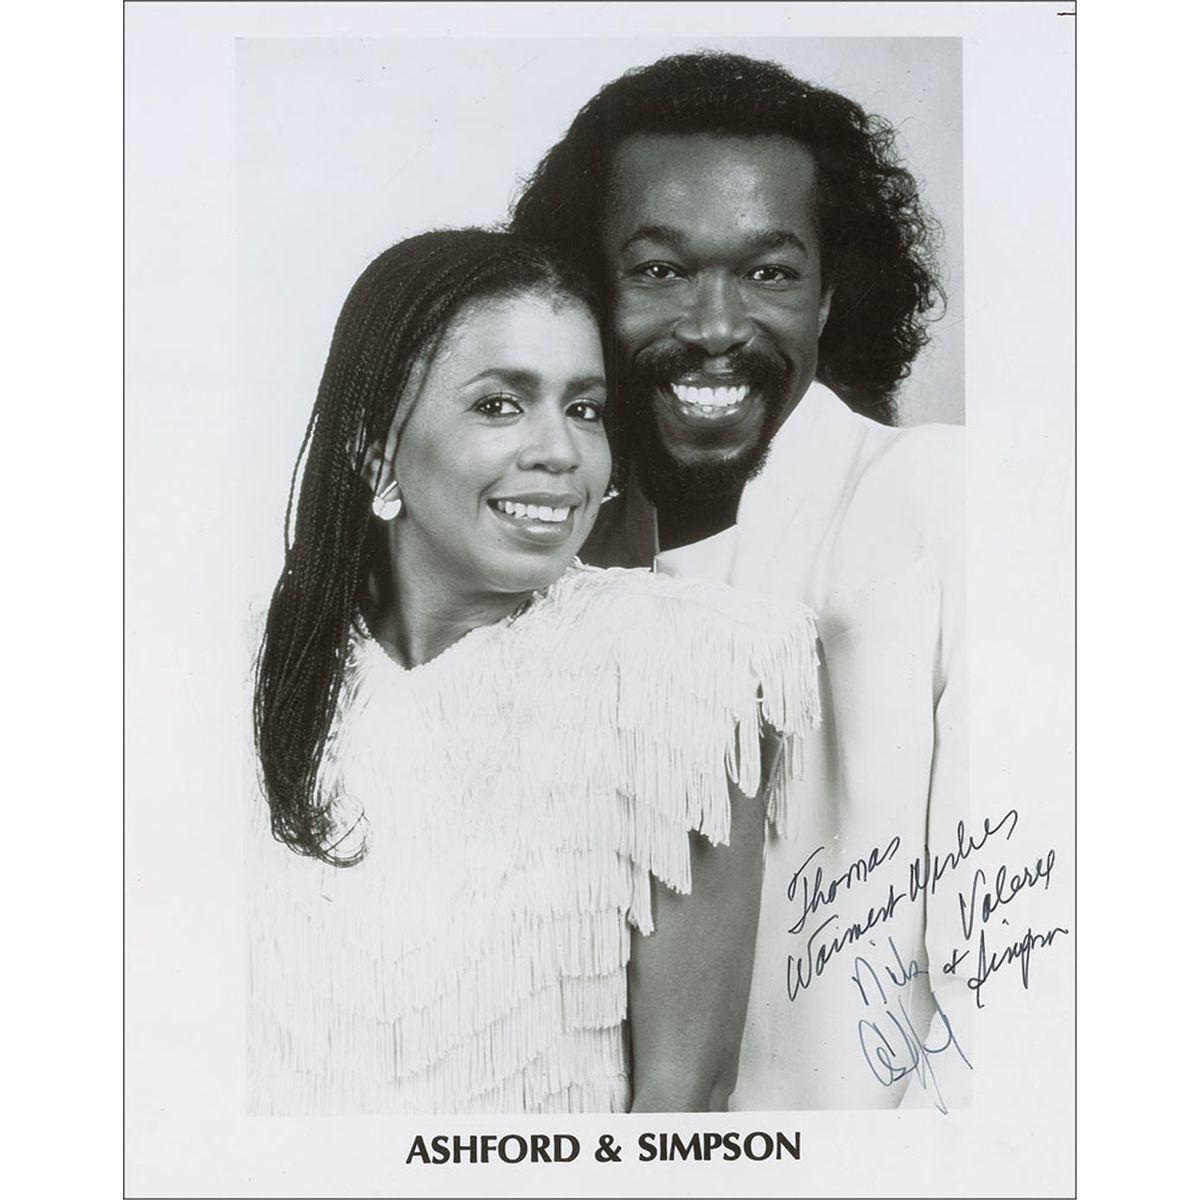 Ashford & Simpson - Flashback